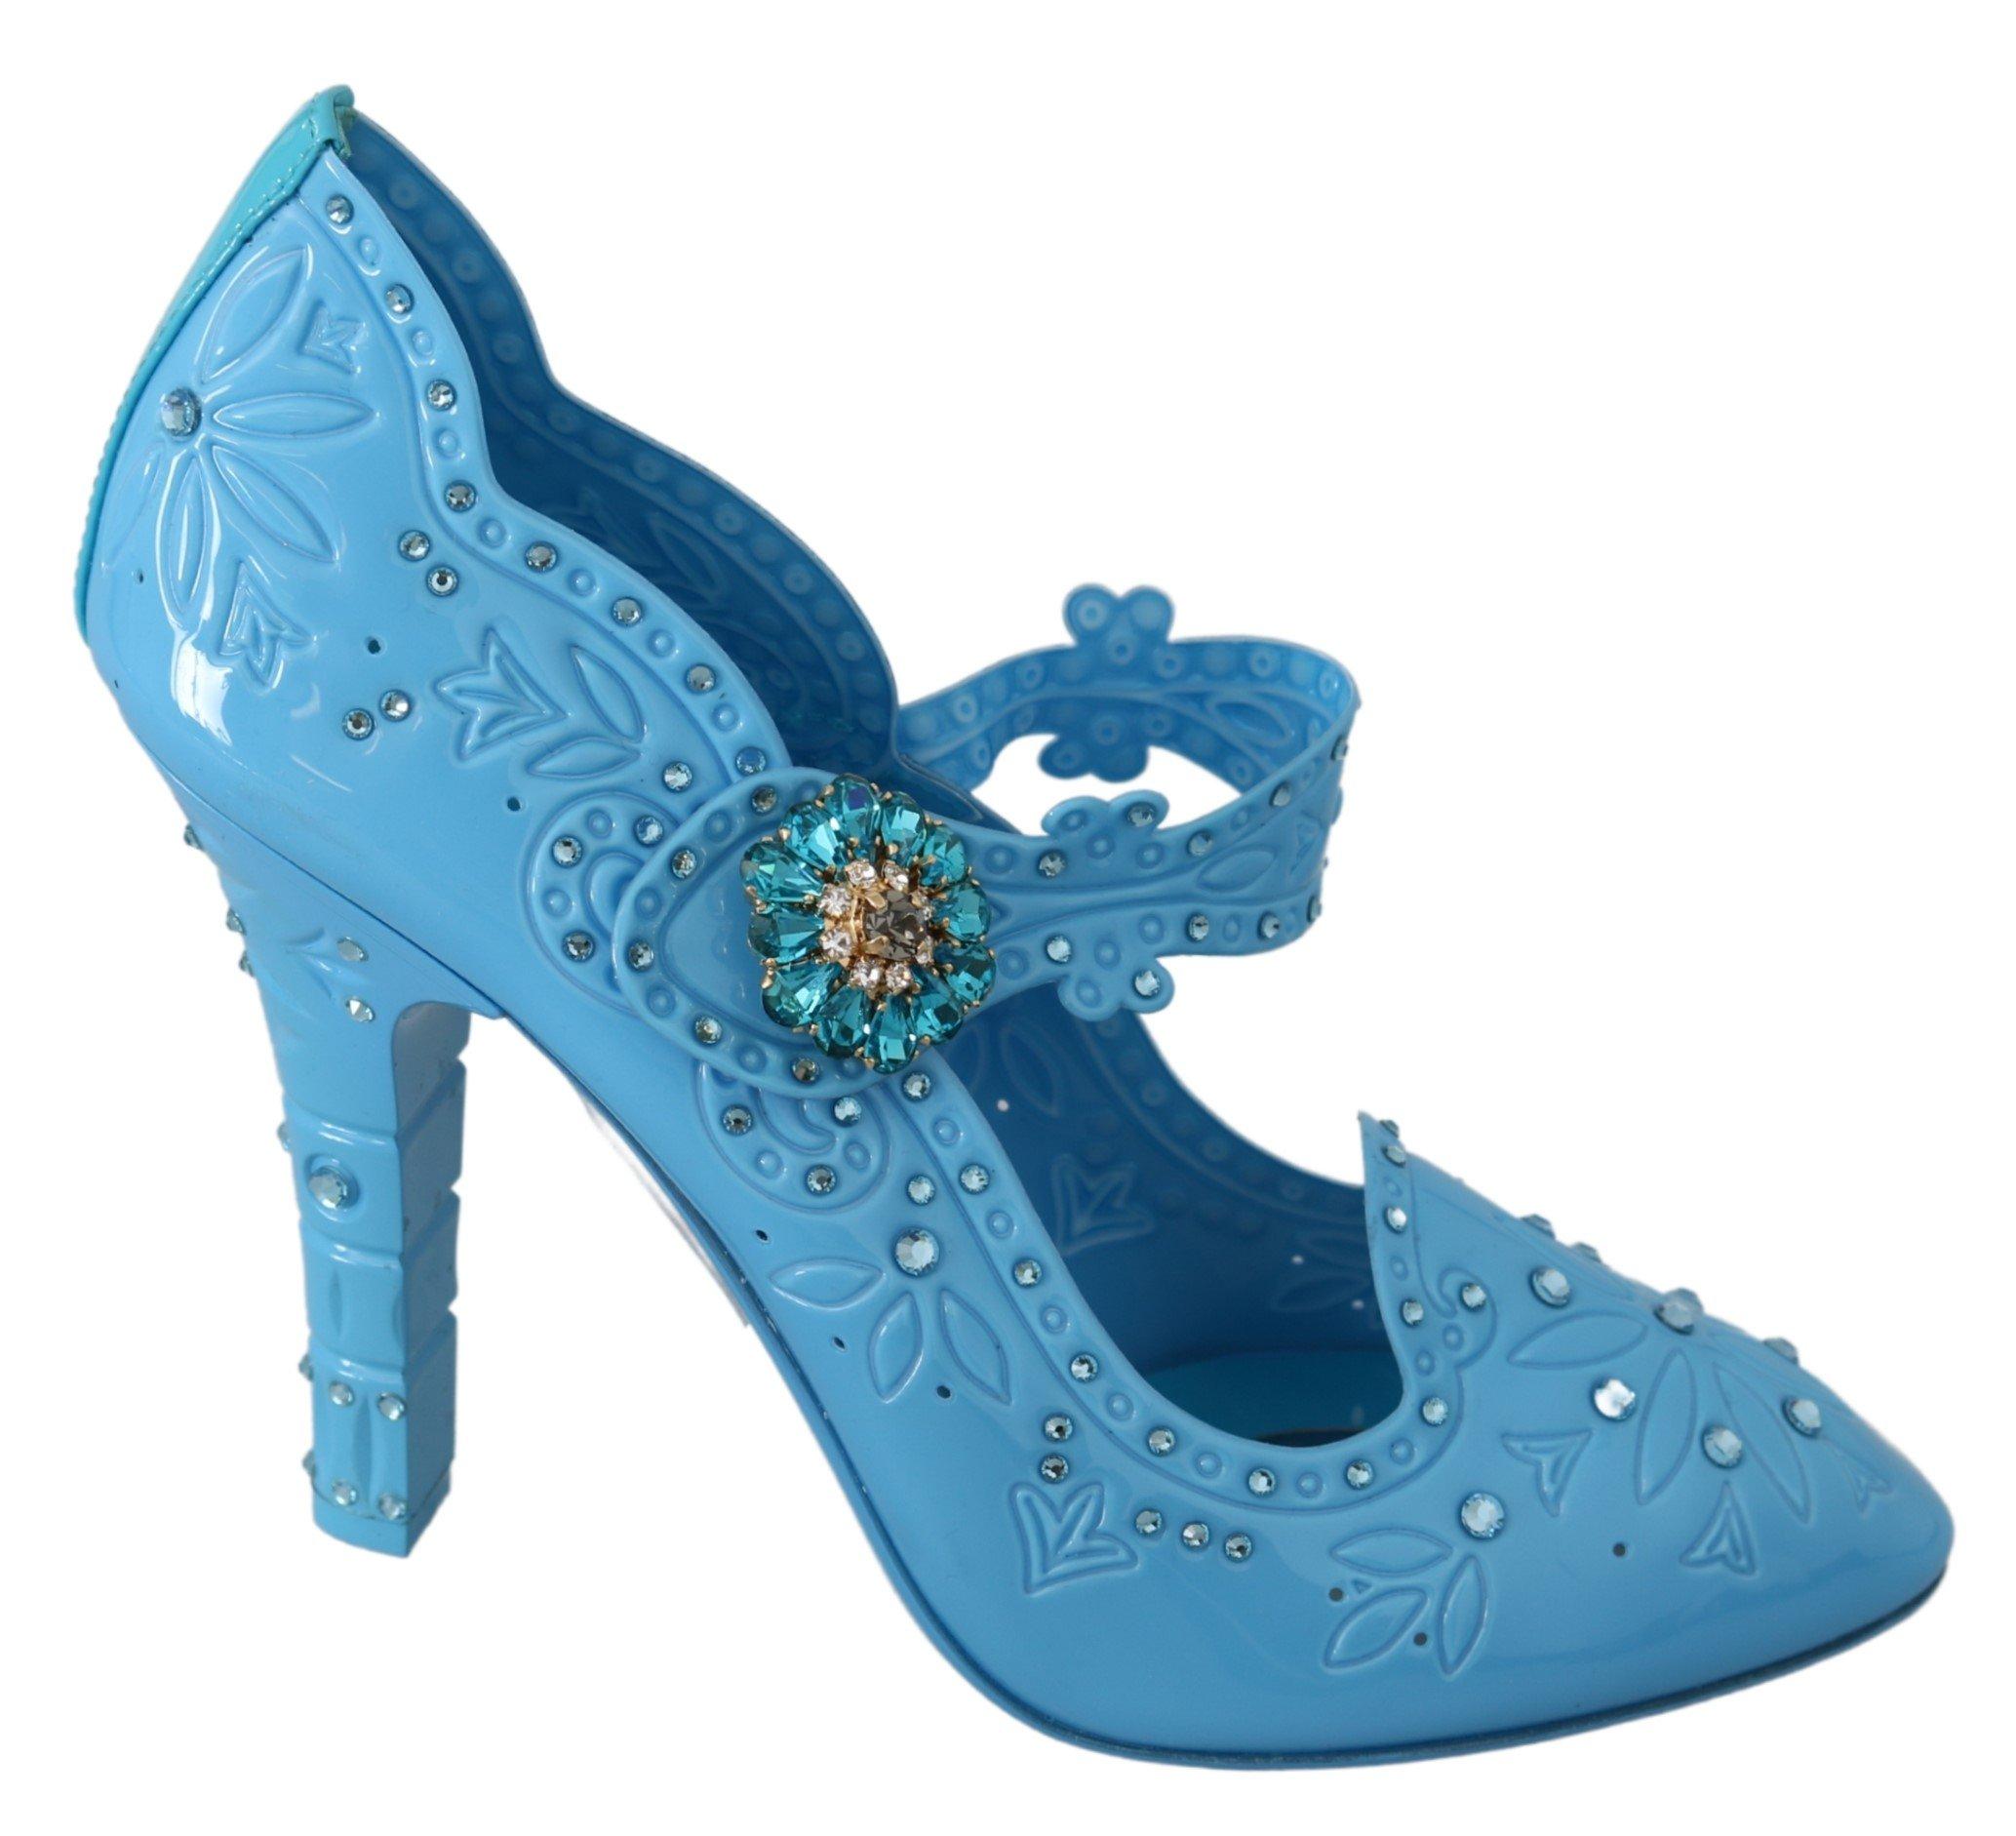 Dolce & Gabbana Women's Floral Crystal CINDERELLA Pumps Blue LA7294 - EU40/US9.5